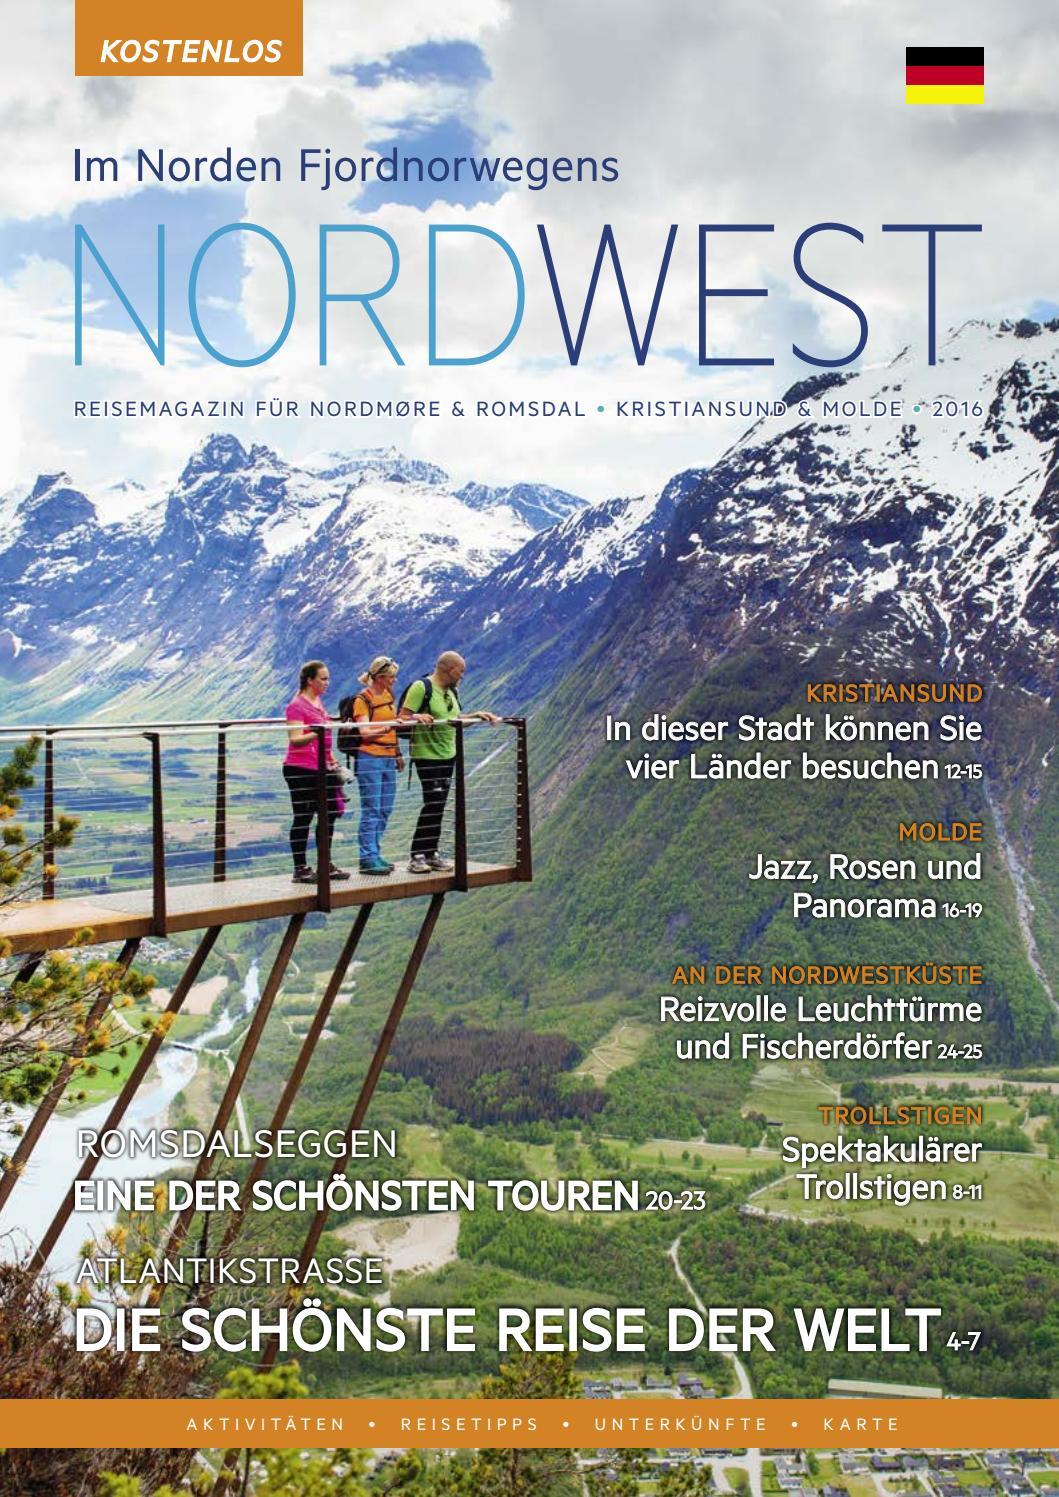 Reisemagazine Nordwest 2016 by Tibe - issuu